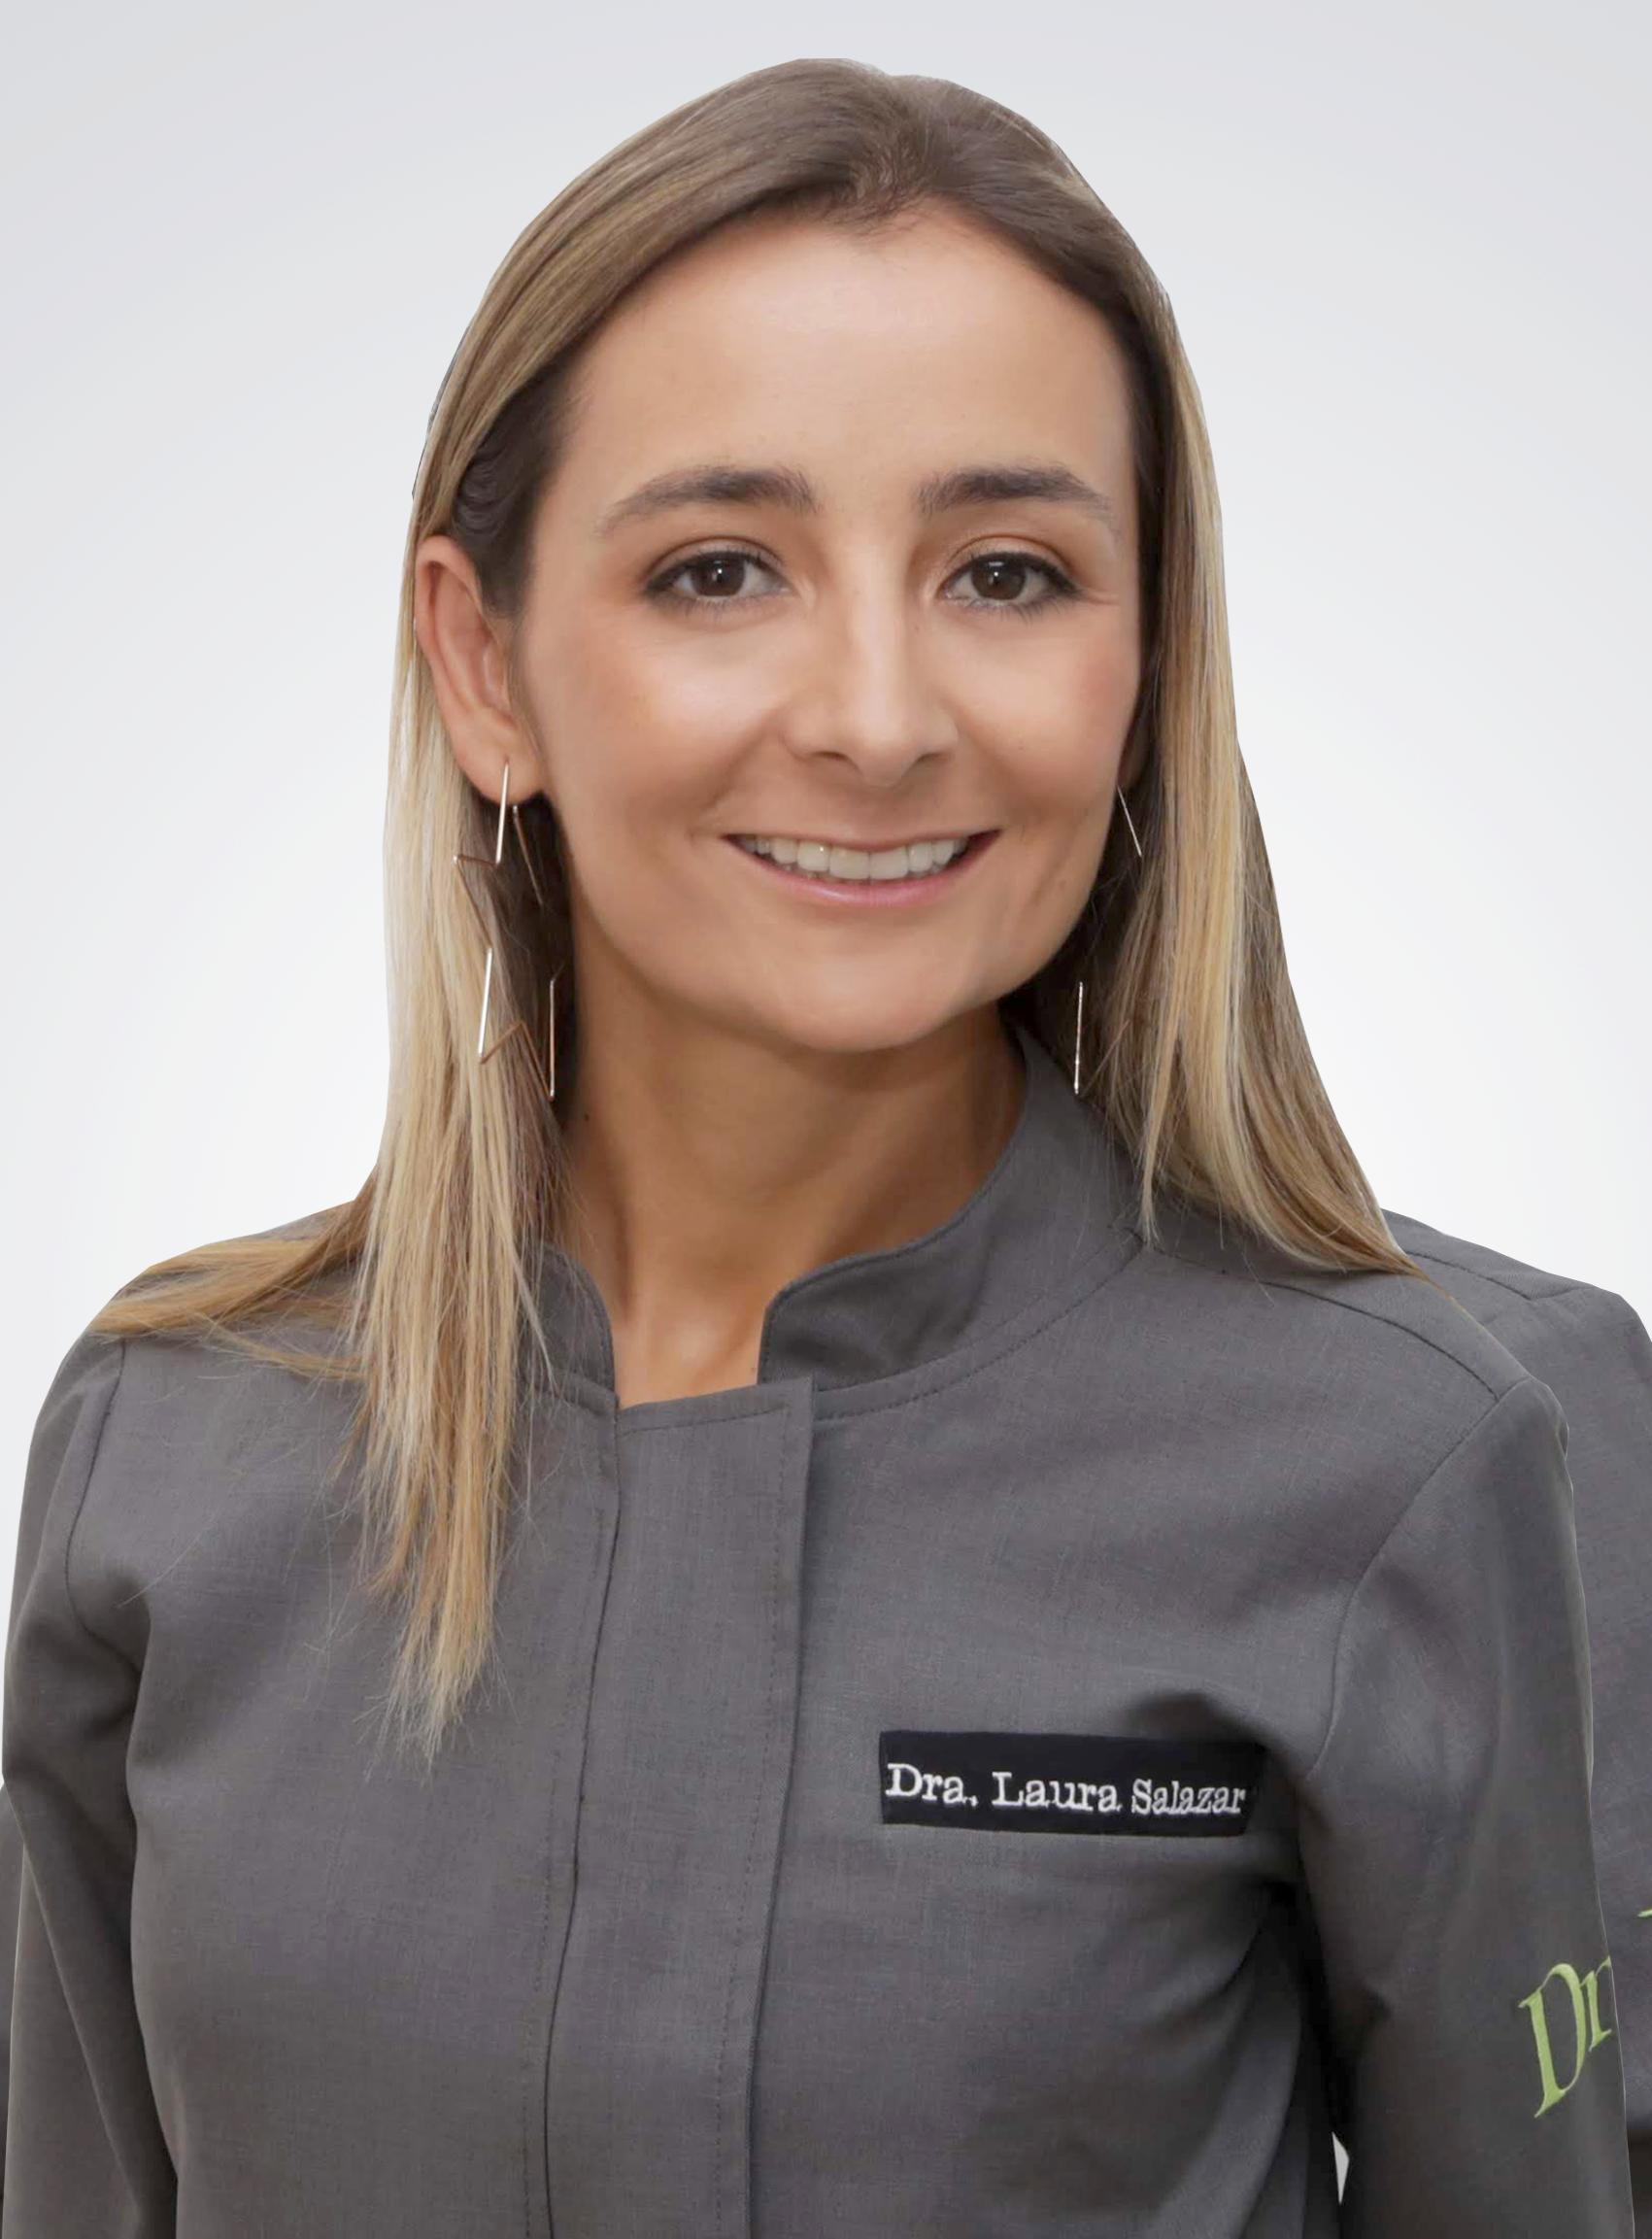 Dra. Laura Salazar Mejia